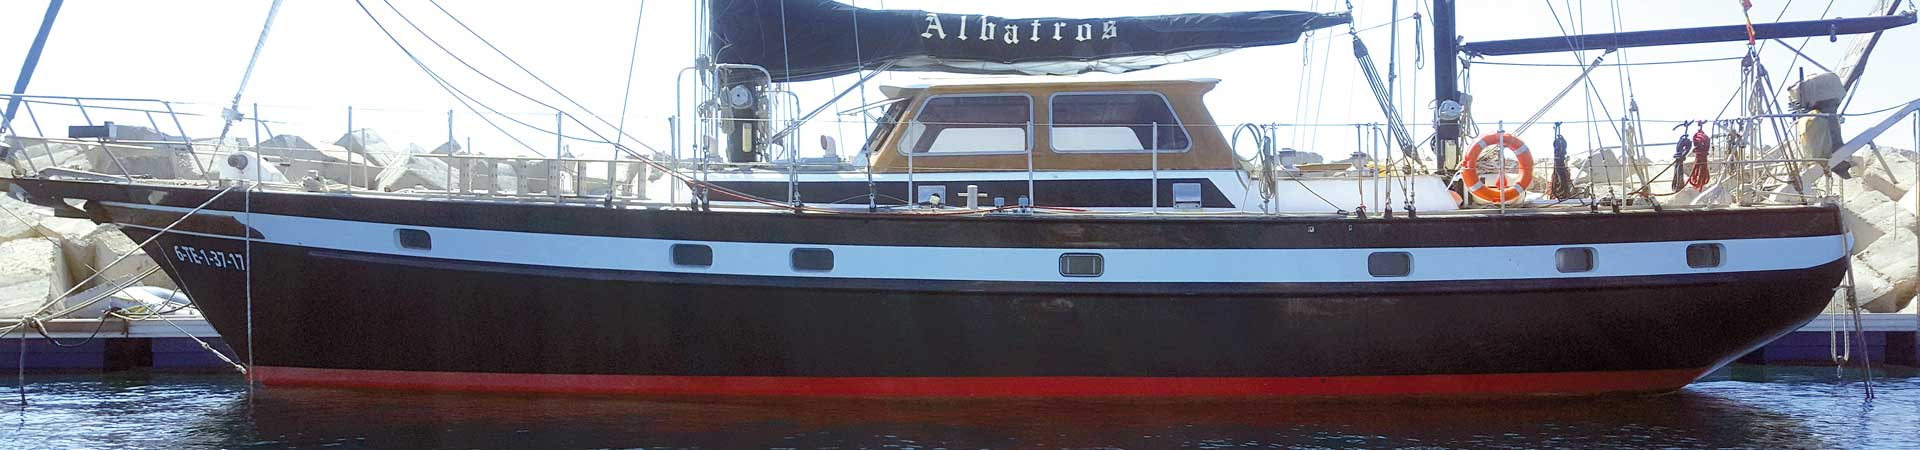 https://www.goodmorningtenerife.com/wp-content/uploads/2018/01/02_slide_albatros-charter-excursions-tenerife-1920x450-good-morning-tenerife.jpg